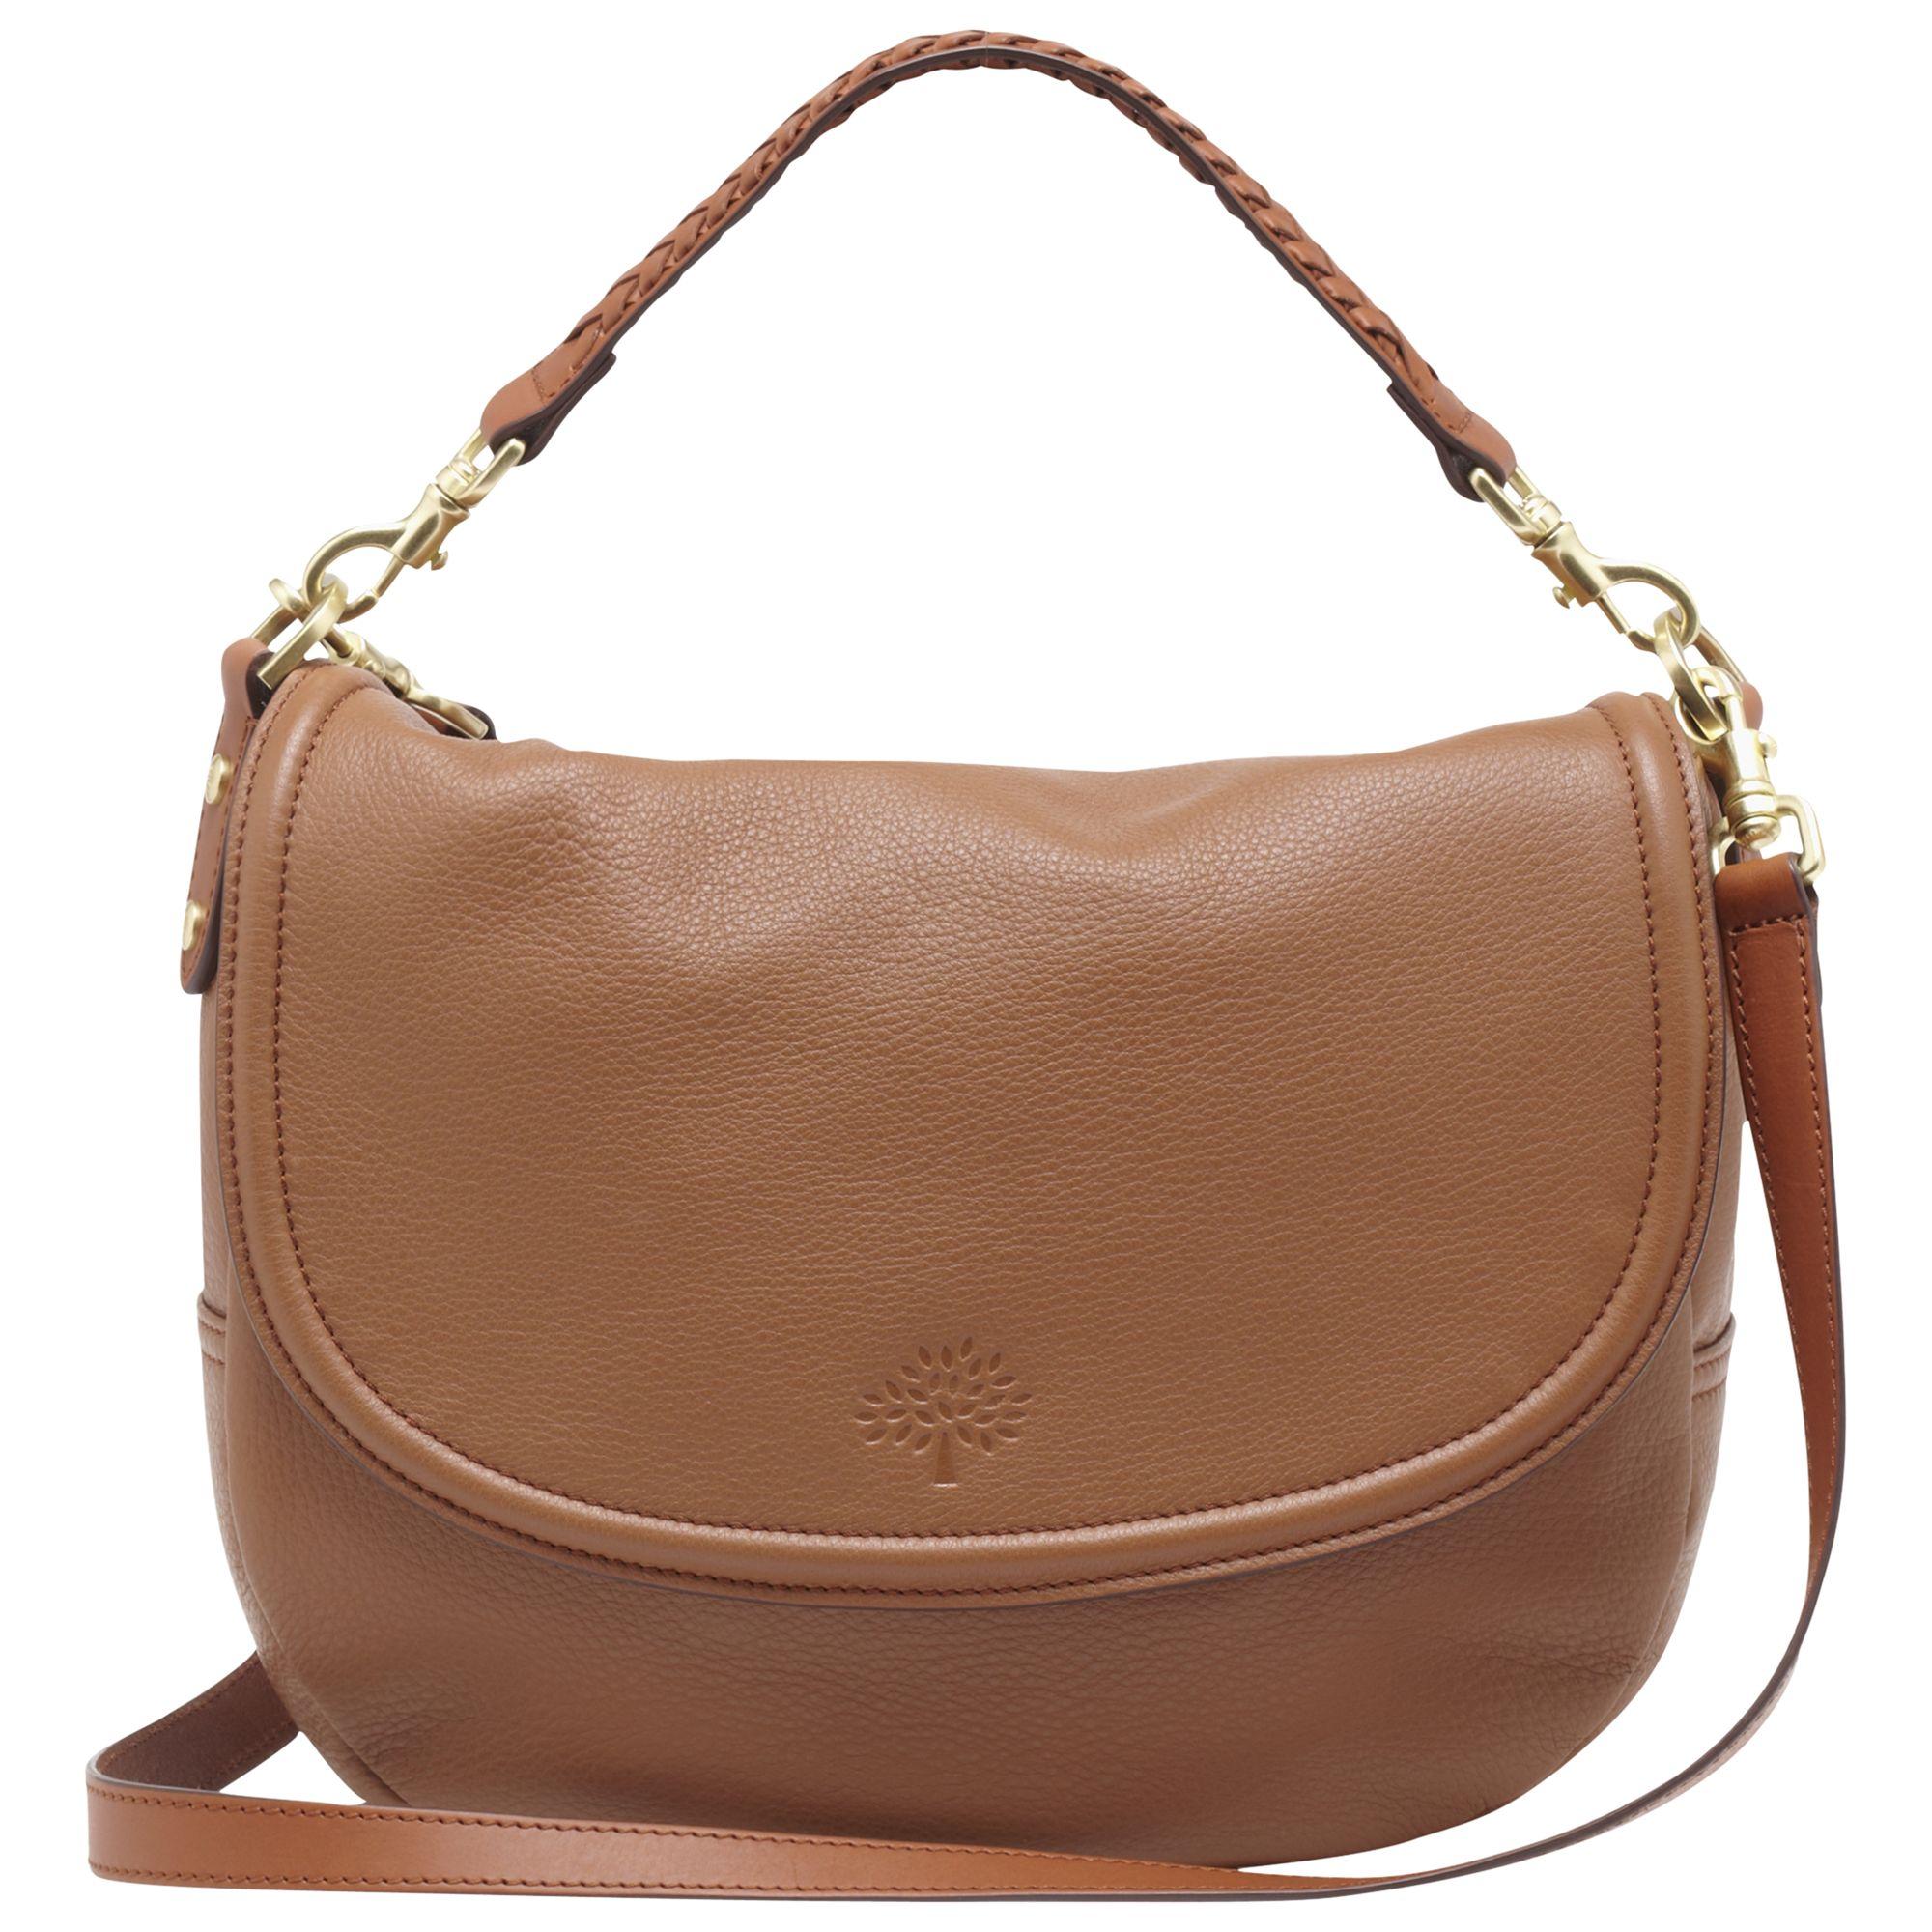 f0fd64c456 Mulberry Leather Effie Satchel Bag at John Lewis   Partners